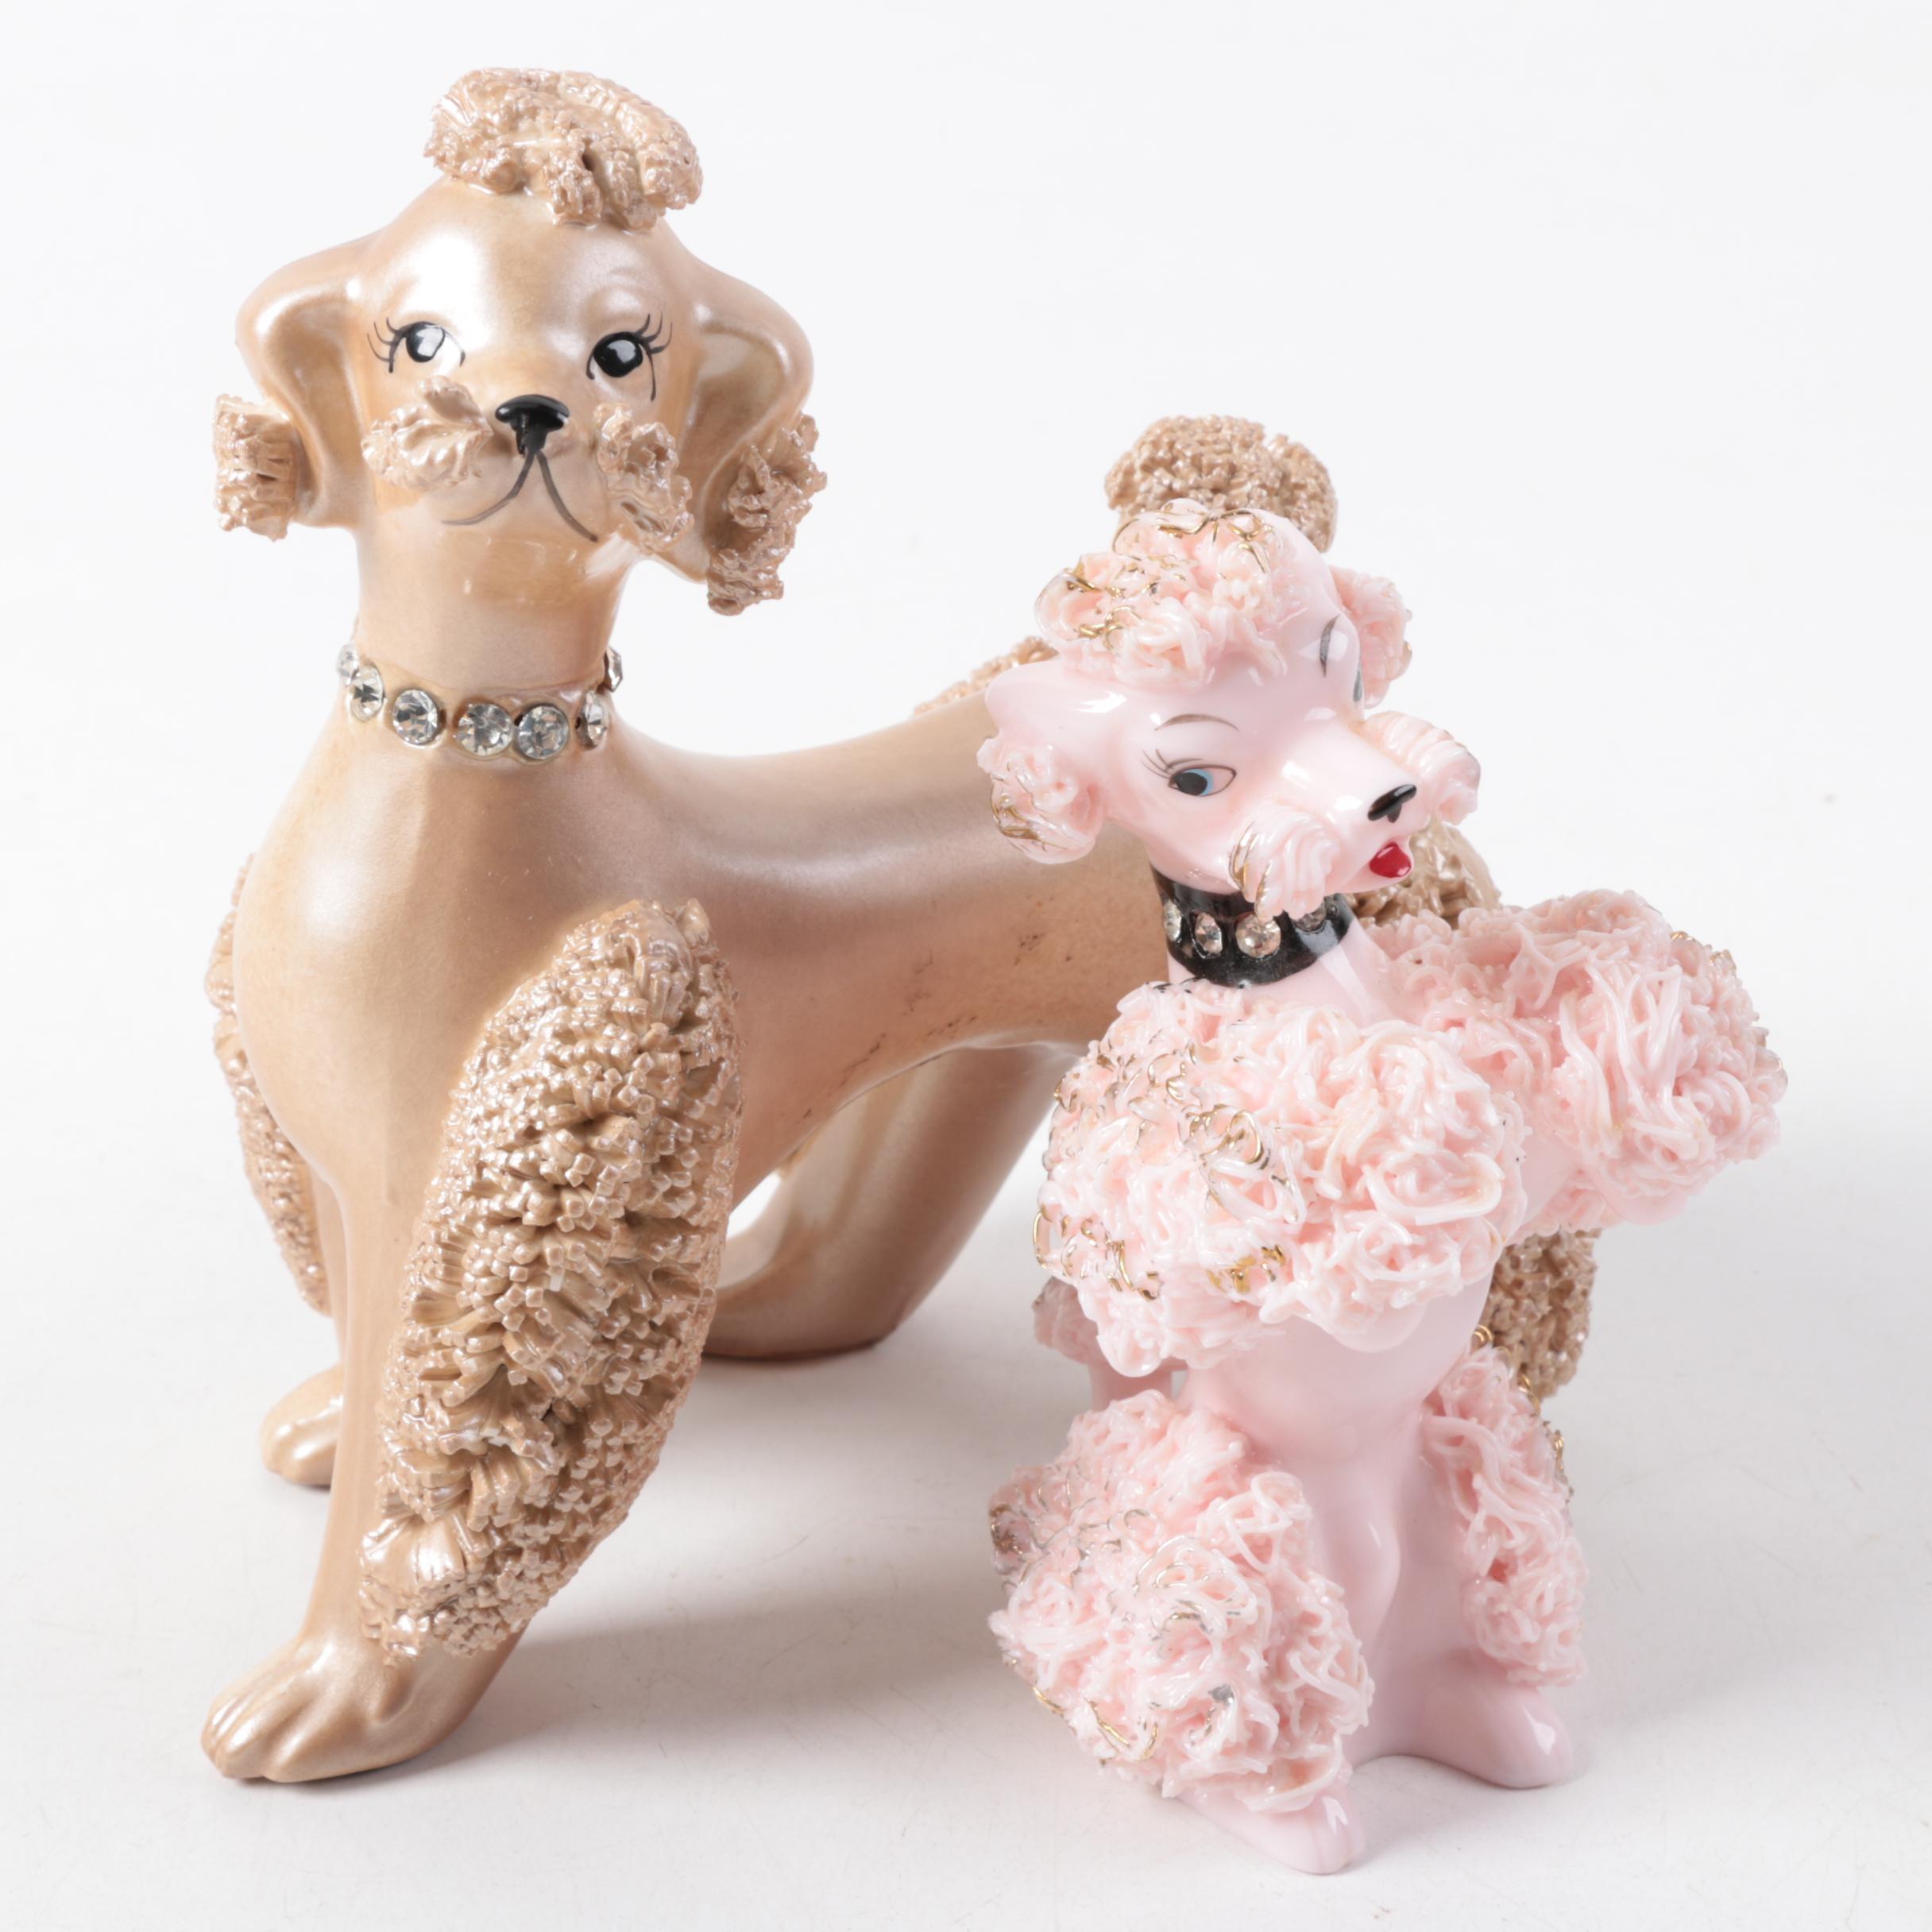 Vintage Brinn's Ceramic Poodle Figurines